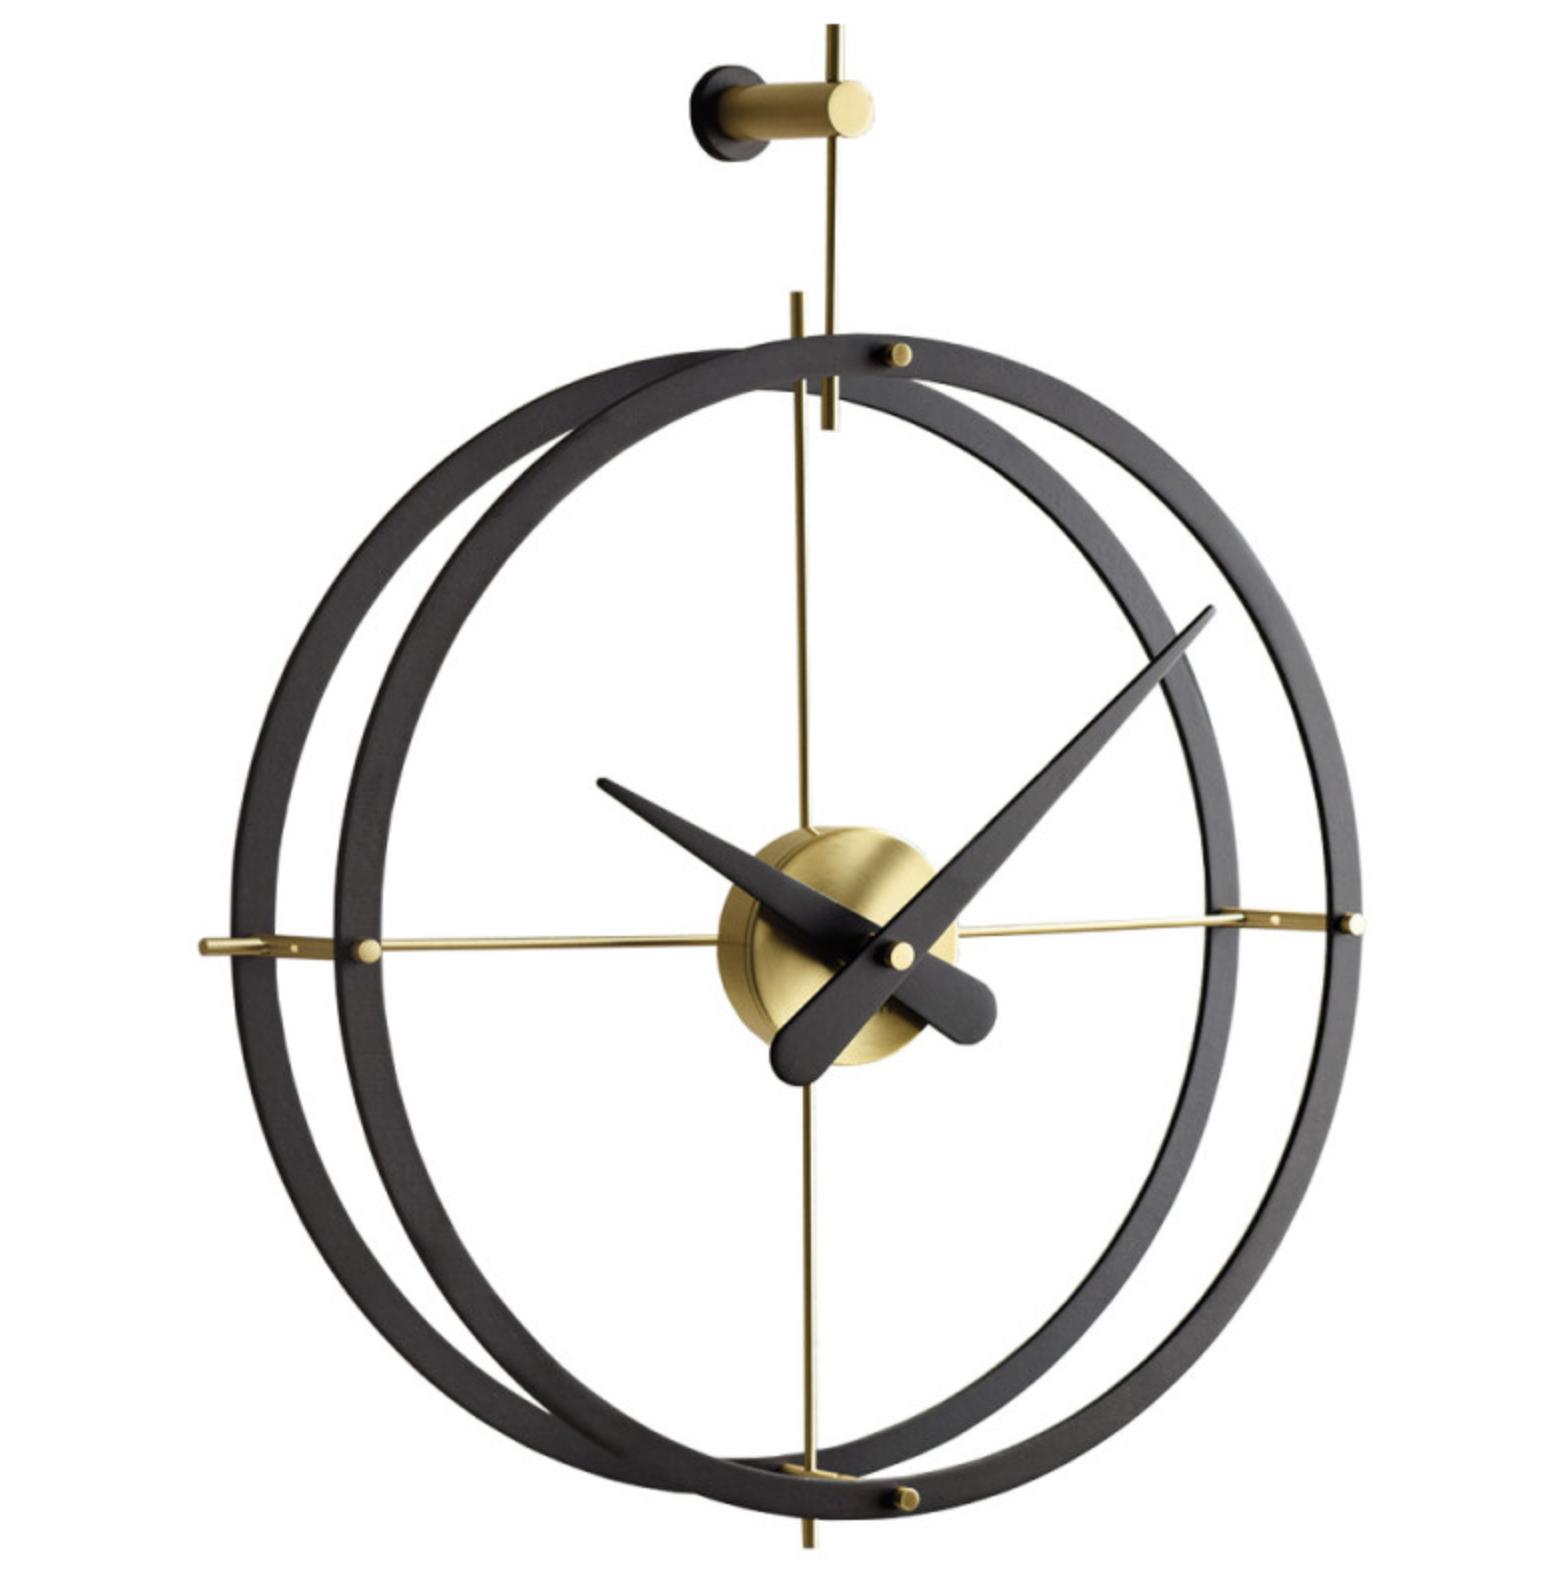 Spanish brand Nomon makes very elegant modern clocks, including this  2Puntos, wood and metal